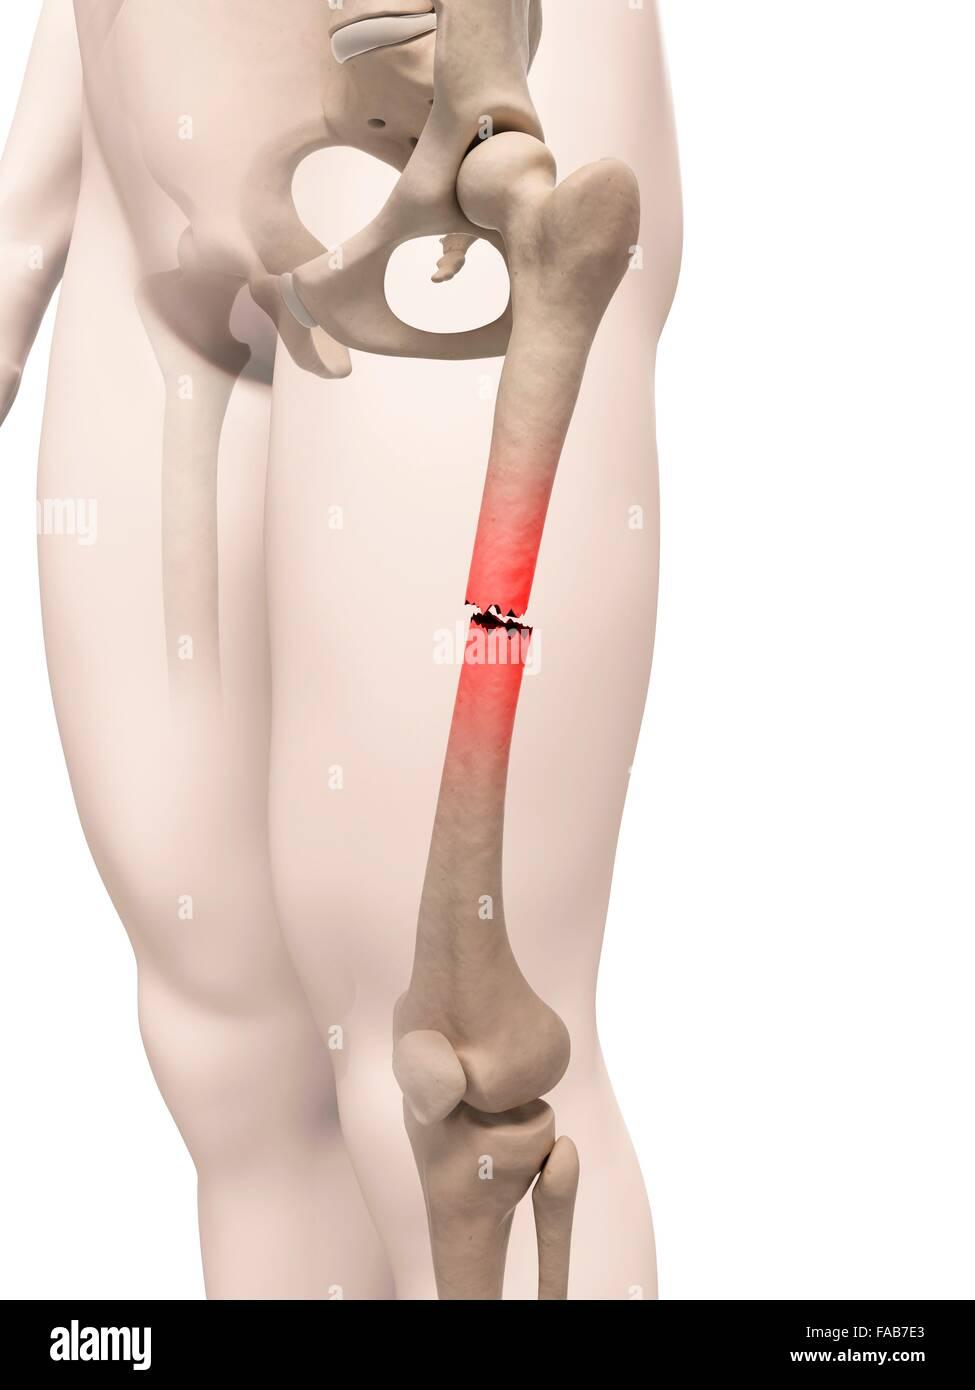 Broken Upper Leg Bone Stock Photos & Broken Upper Leg Bone Stock ...